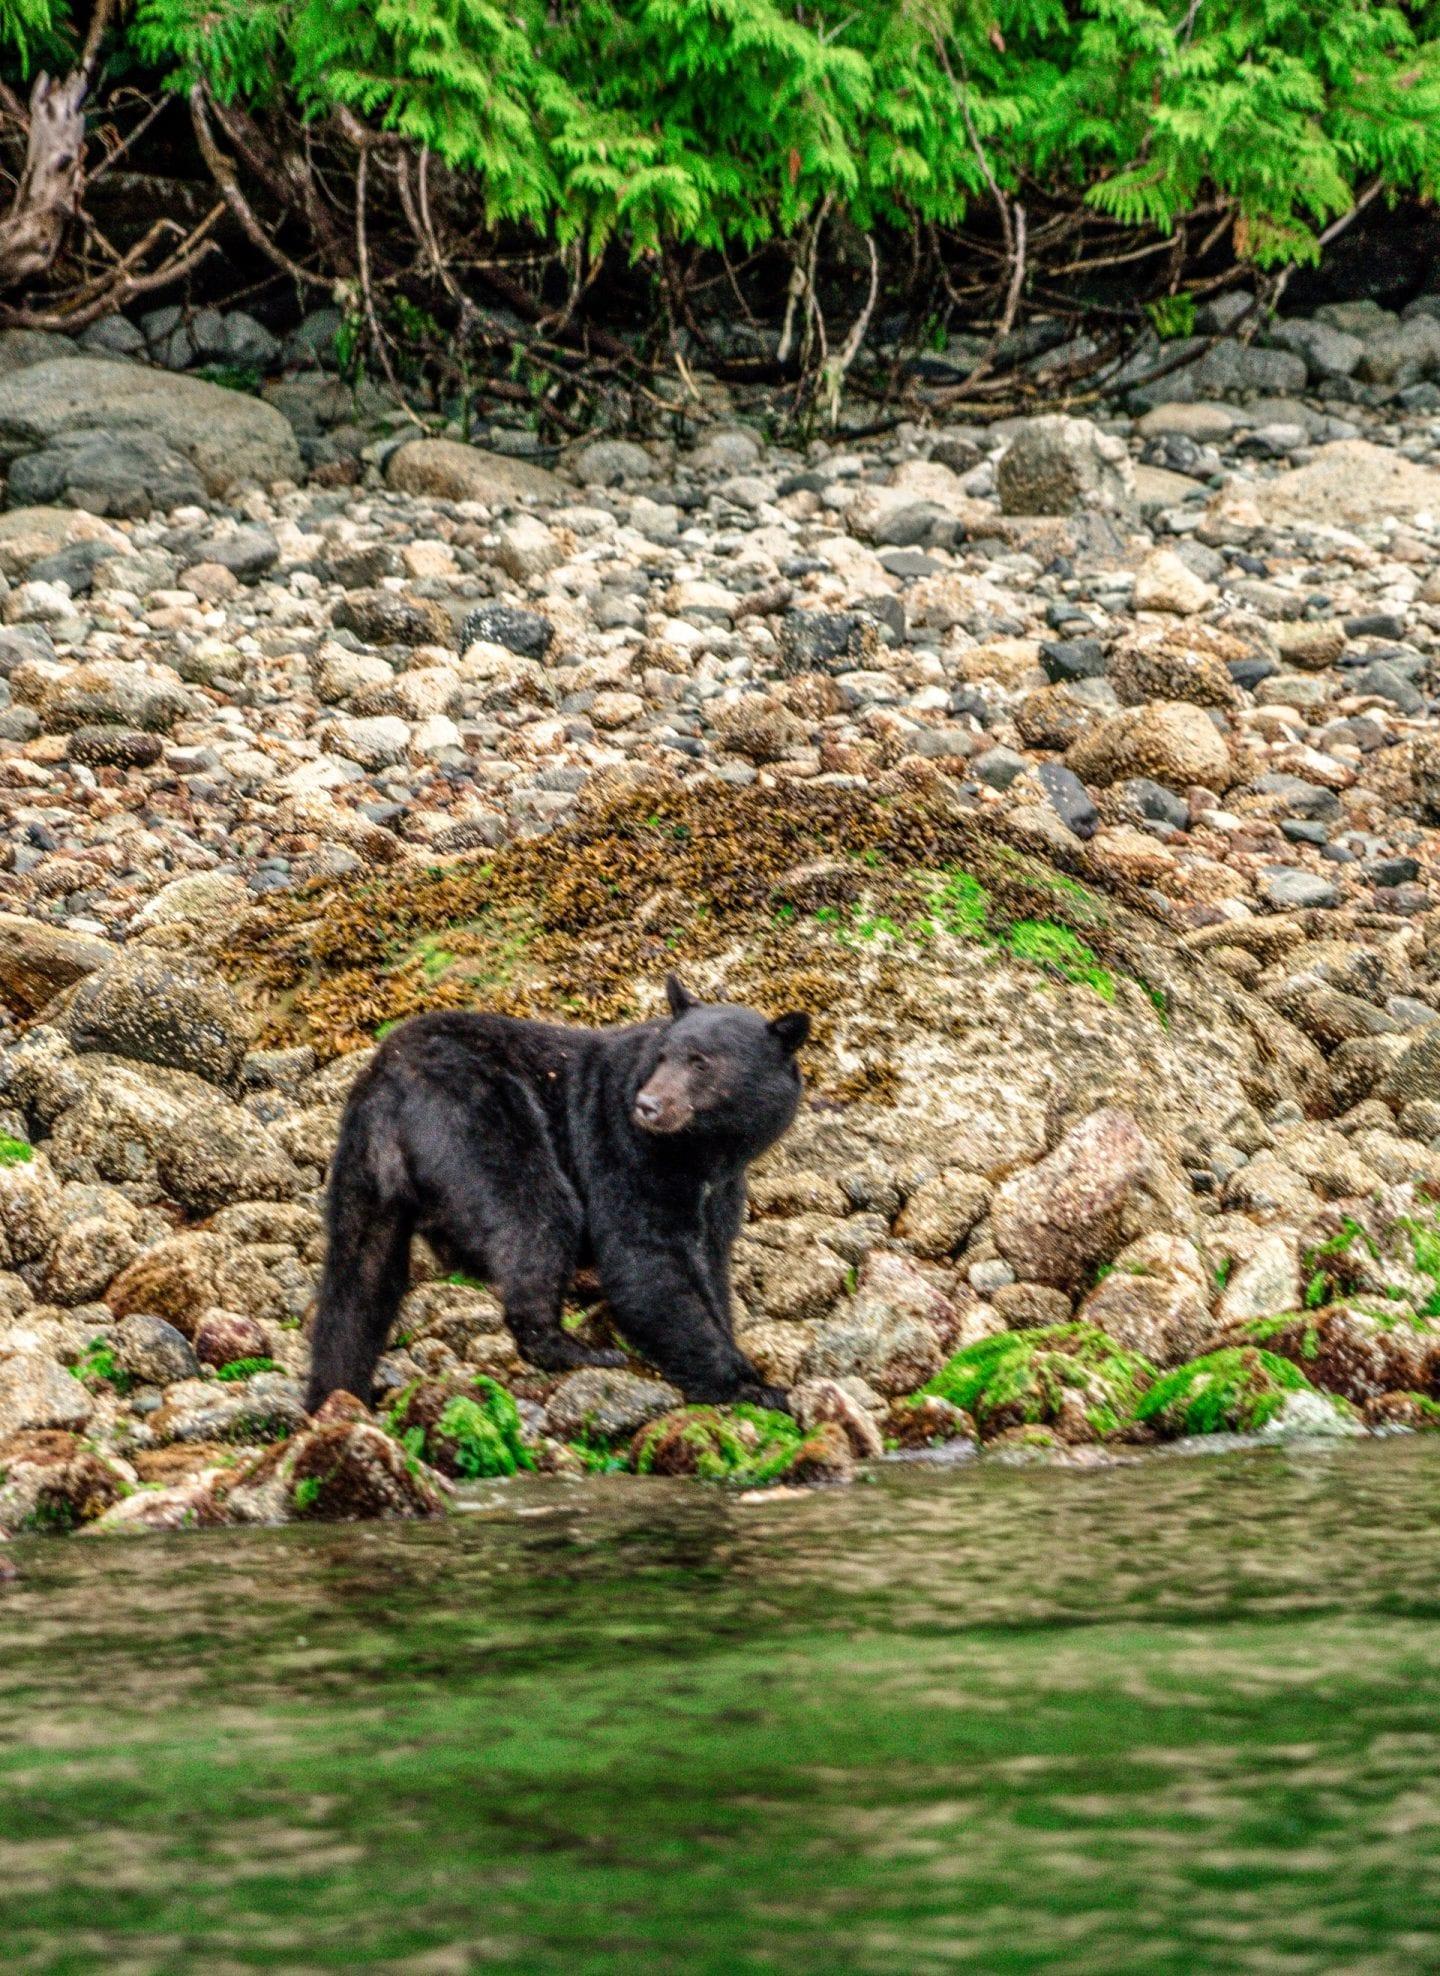 Bear watching tour, Clayoquot Wild Tours, Tofino, BC Canada